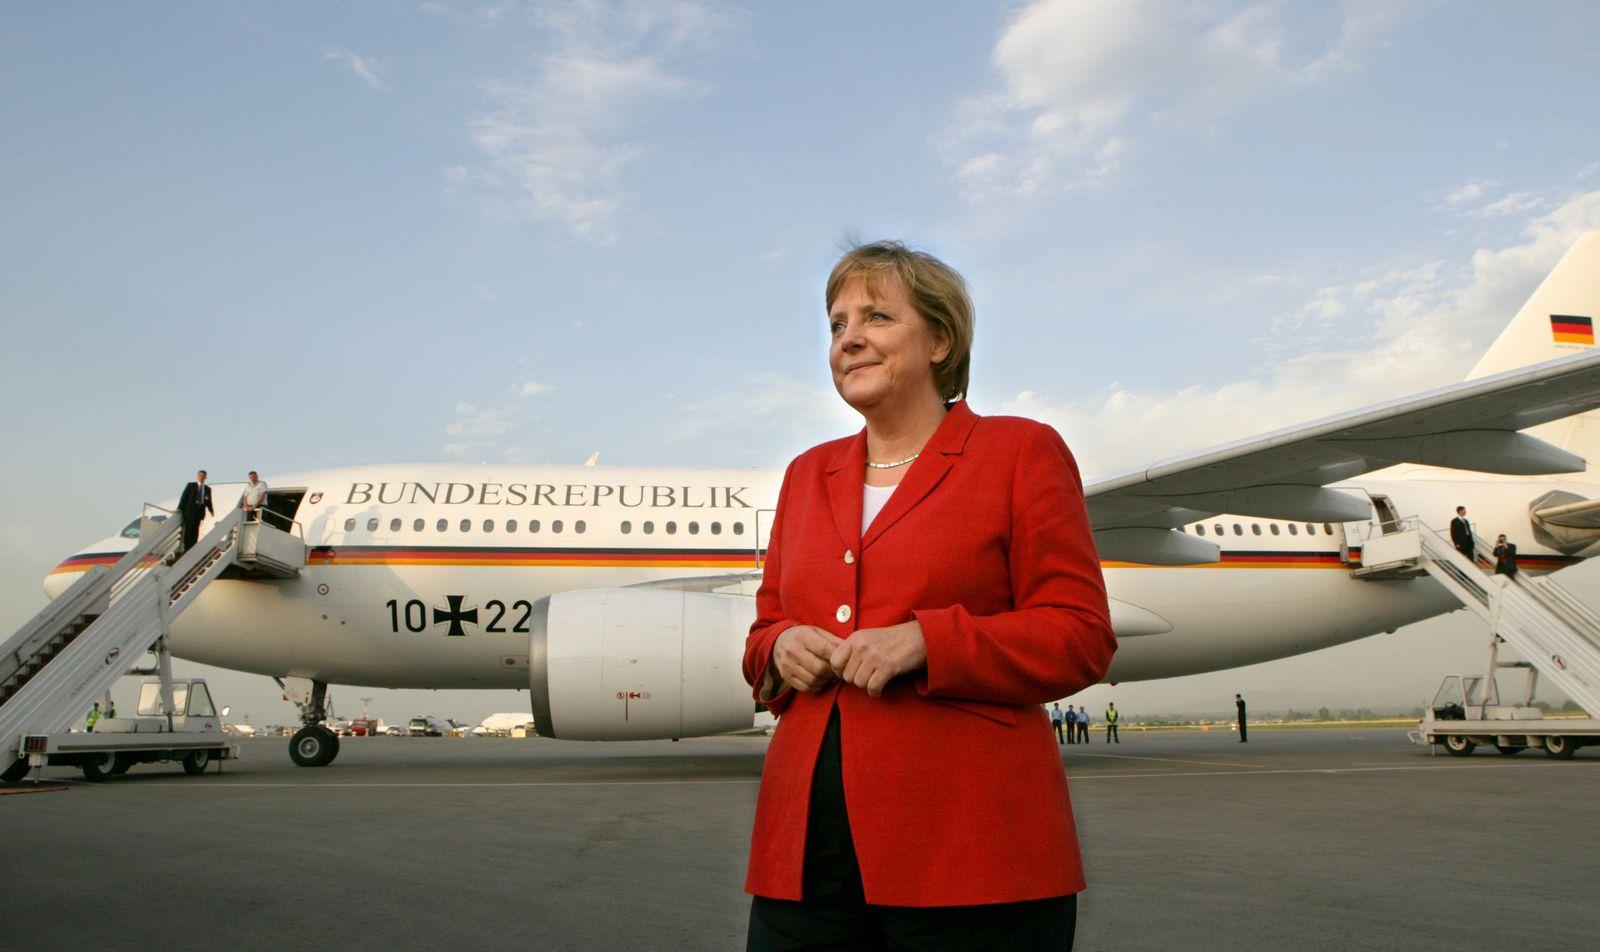 Airbus A310/ Theodor Heuss / Merkel